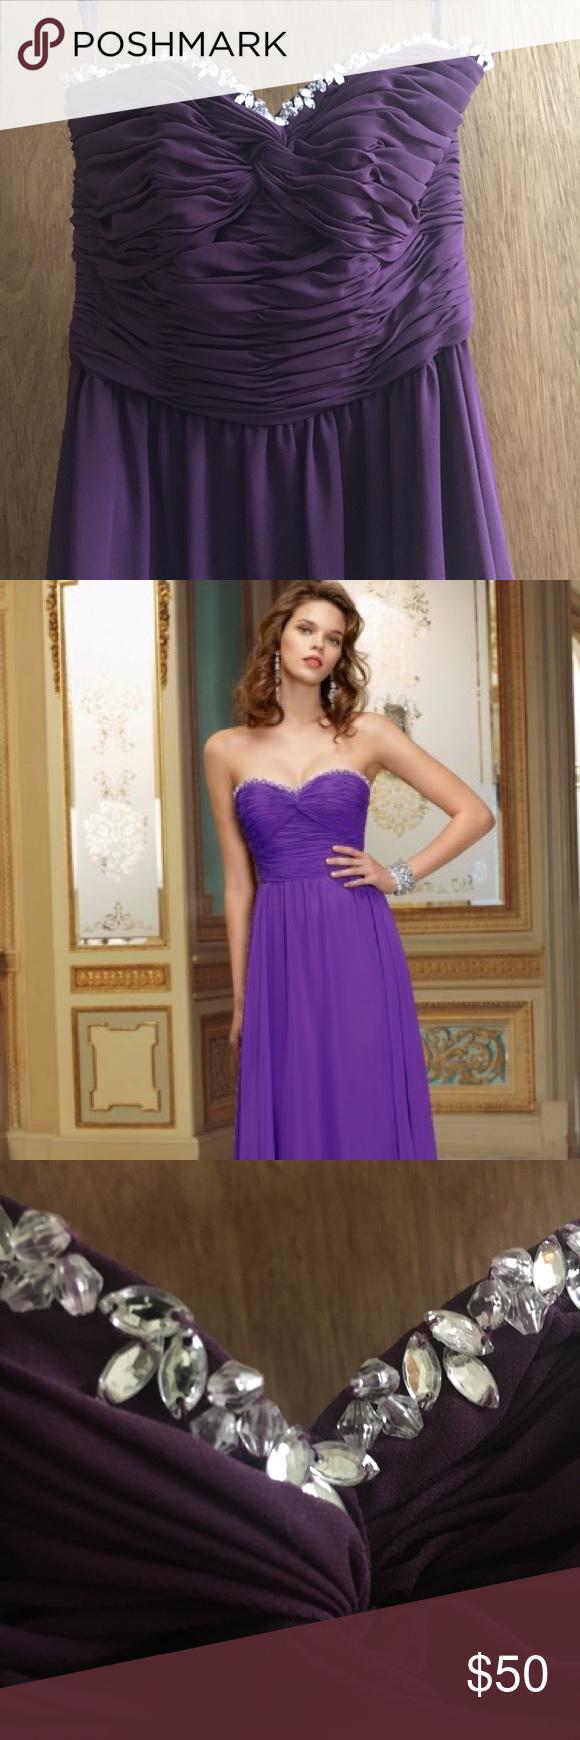 Strapless purple beaded bridesmaid dress size 2